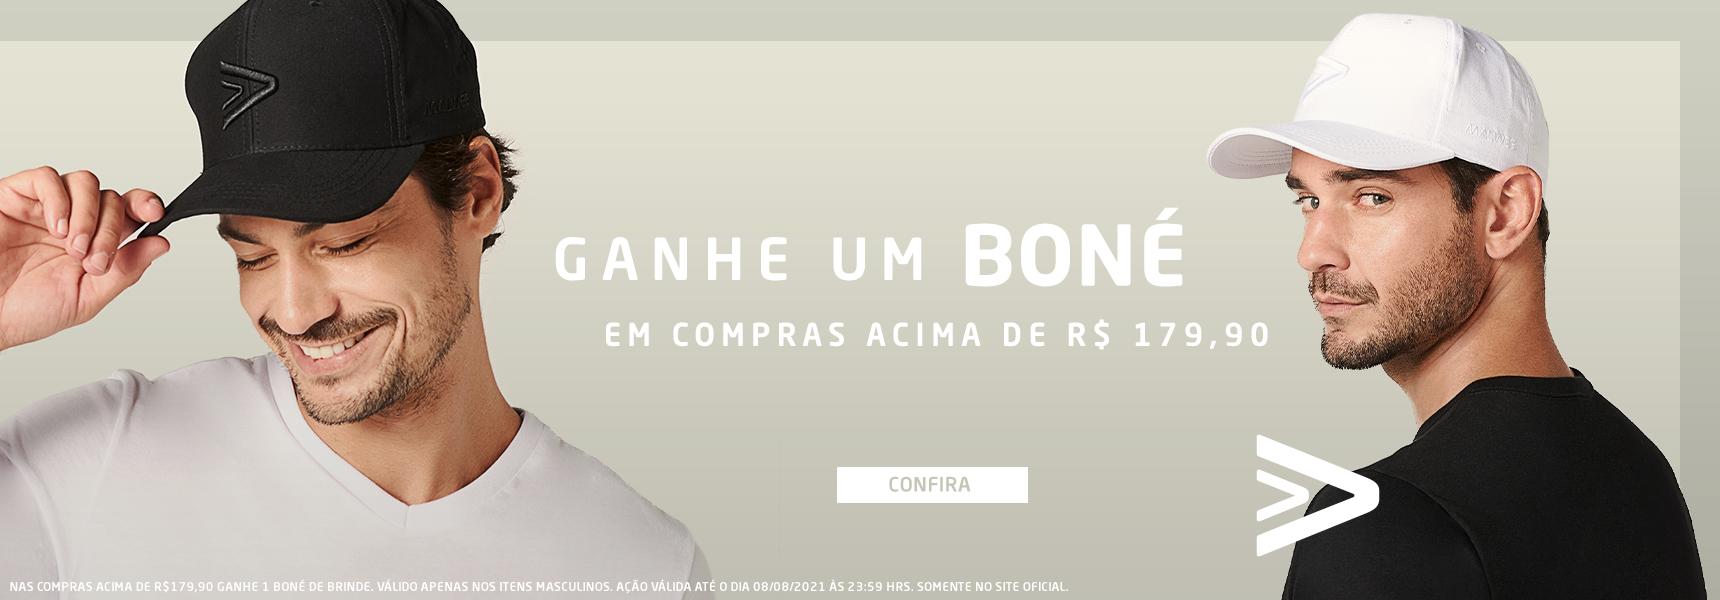 Banner Bonés Desktop